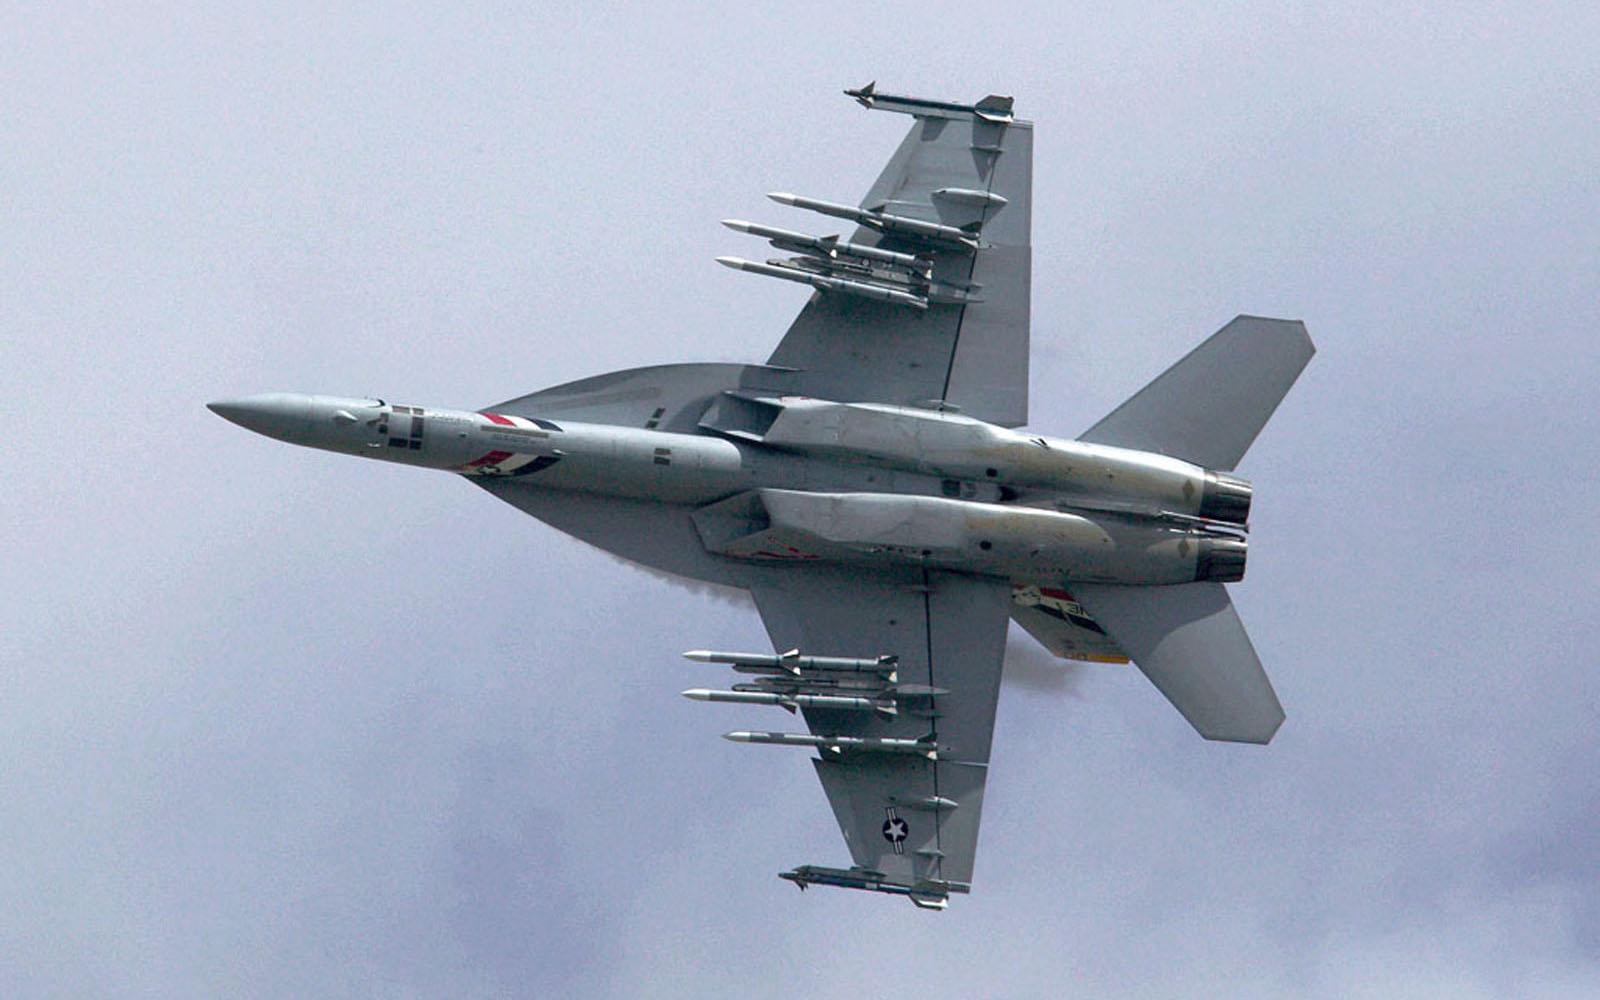 Super Cars 3d Wallpapers Wallpapers F A 18f Super Hornet Aircraft Wallpapers